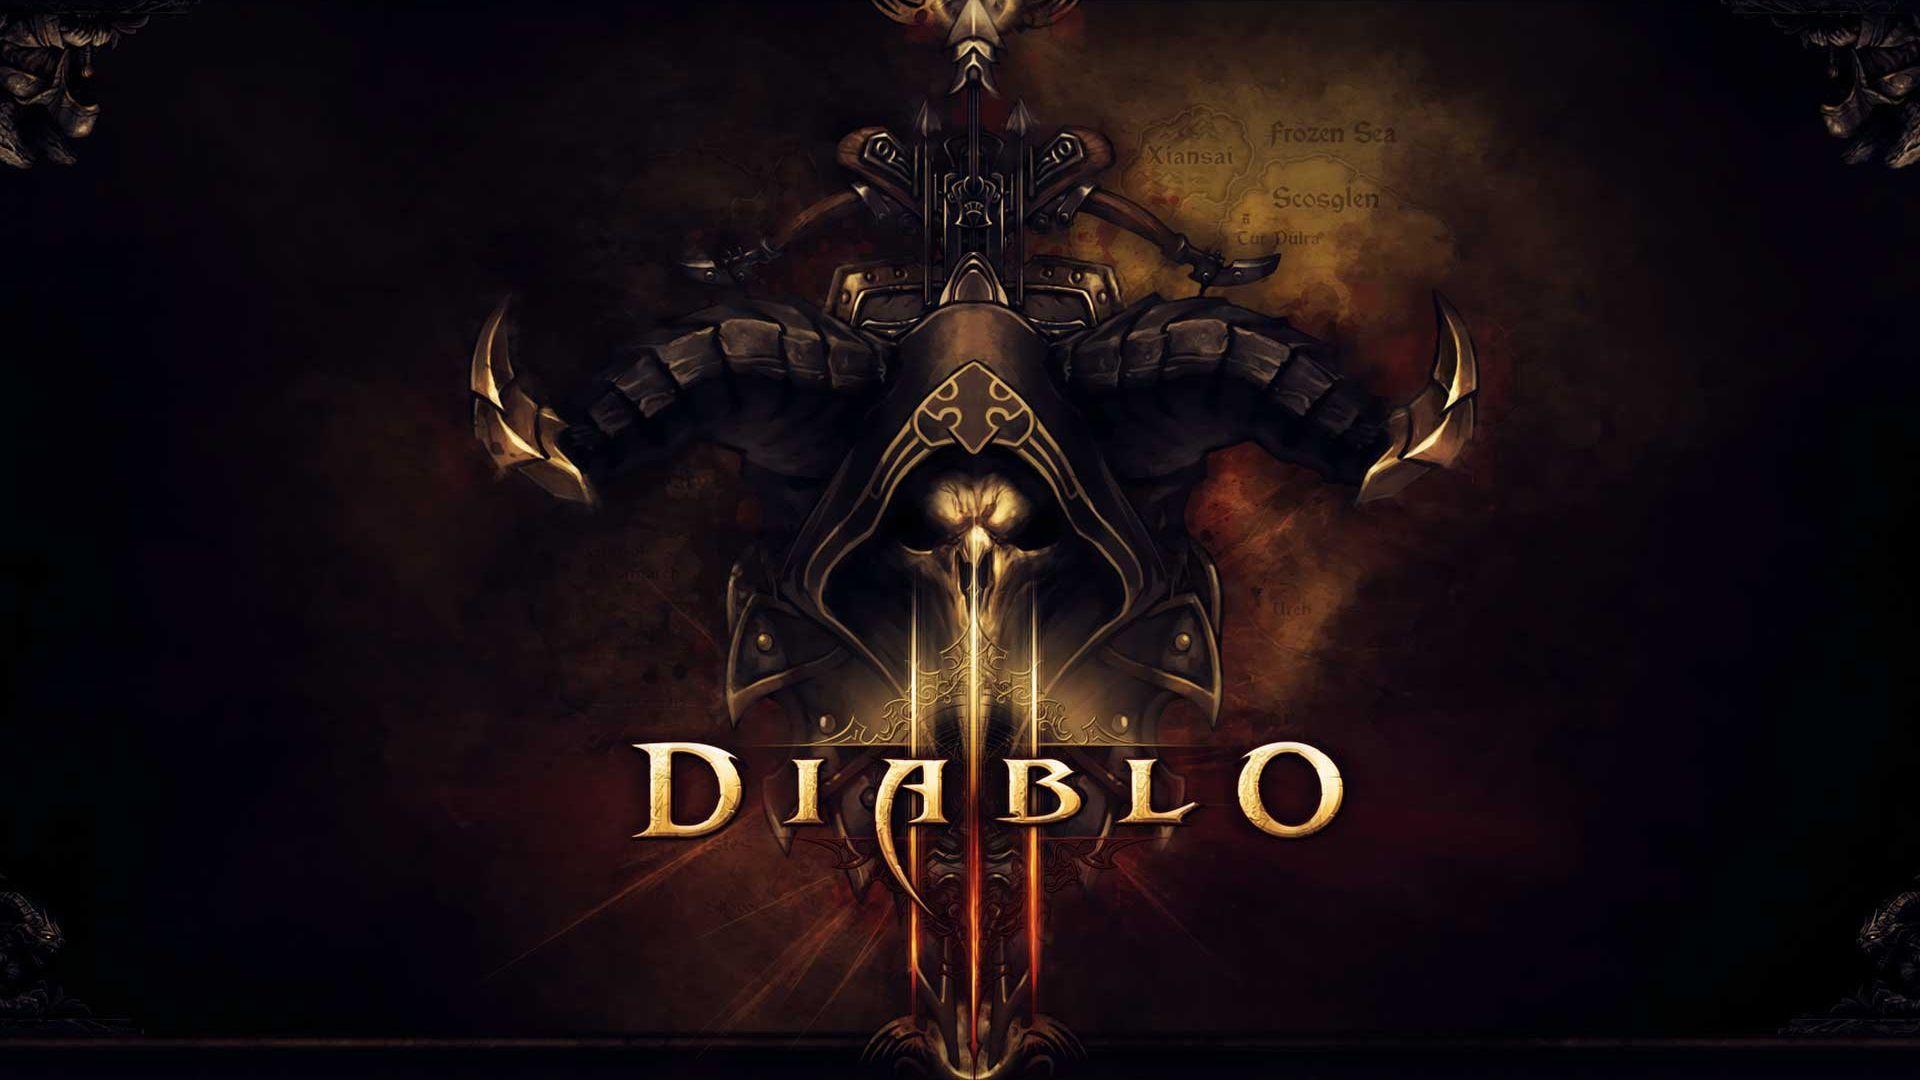 Diablo III Demon Hunter Artwork HD Wallpaper FullHDWpp   Full HD 1920x1080